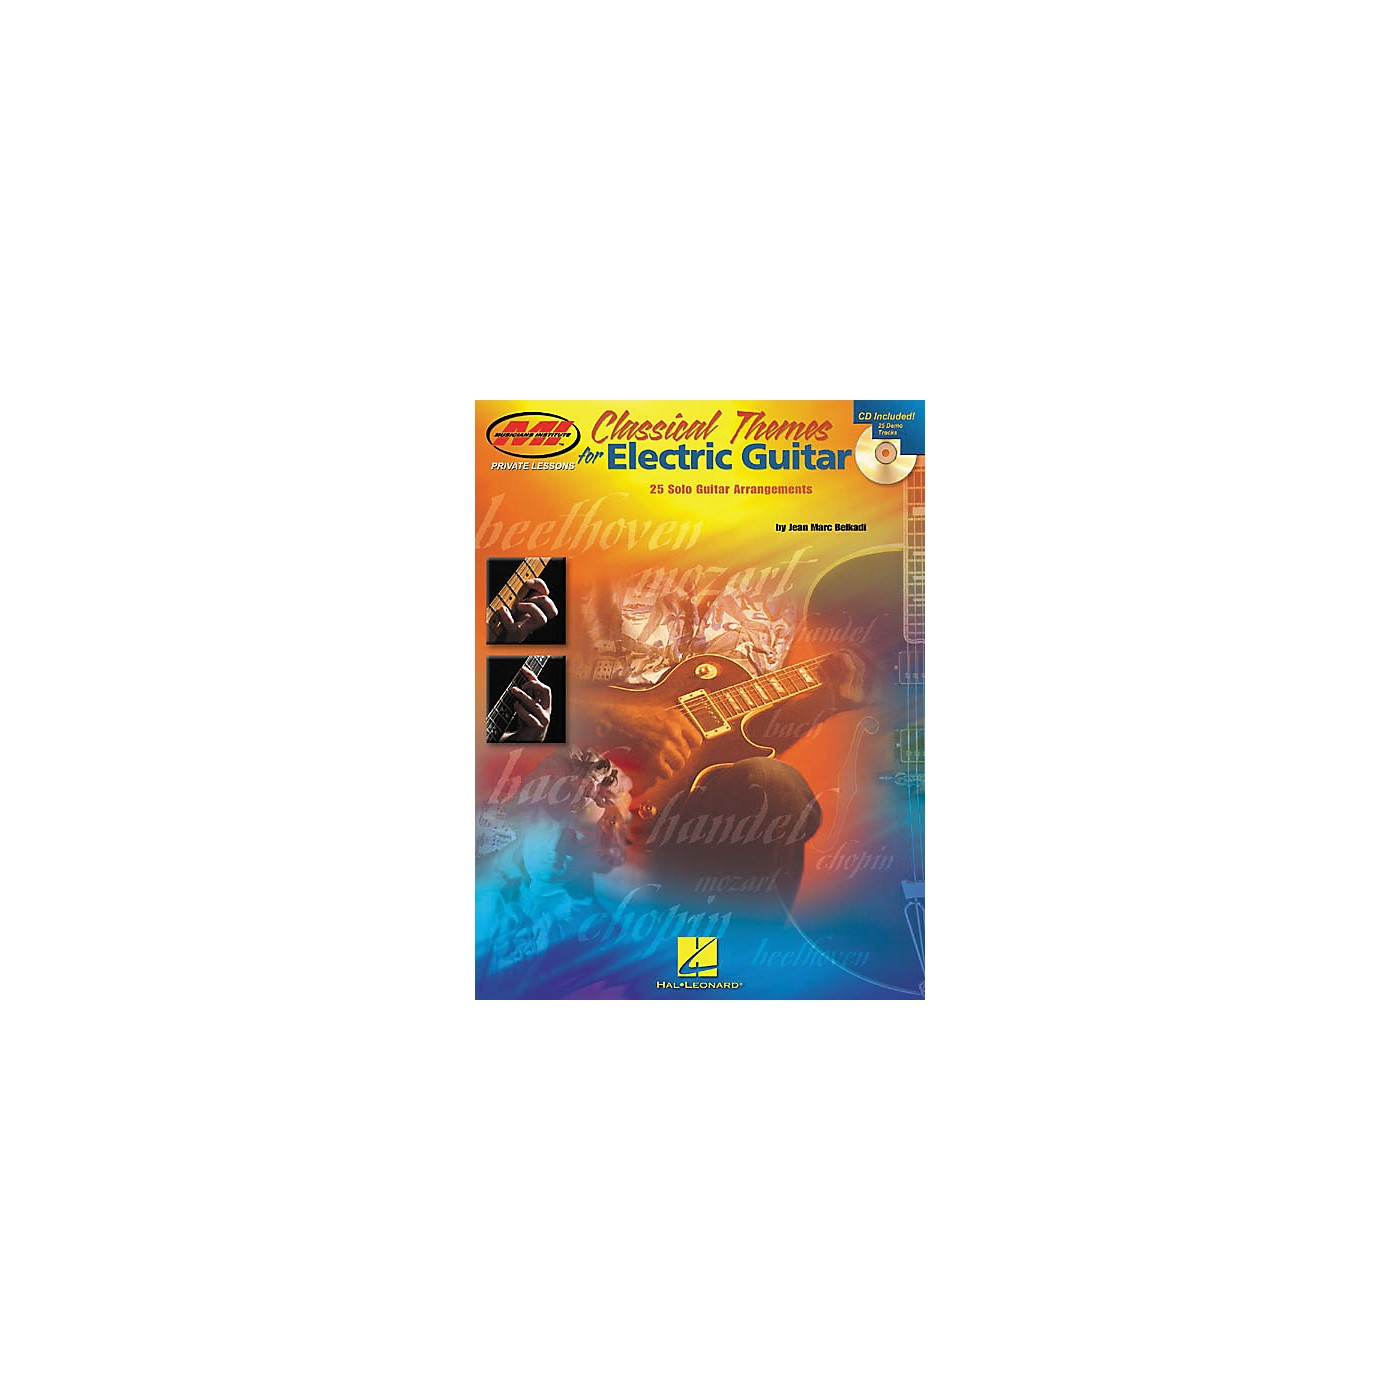 Homespun Classical Themes for Electric Guitar Guitar Tab Book with CD thumbnail